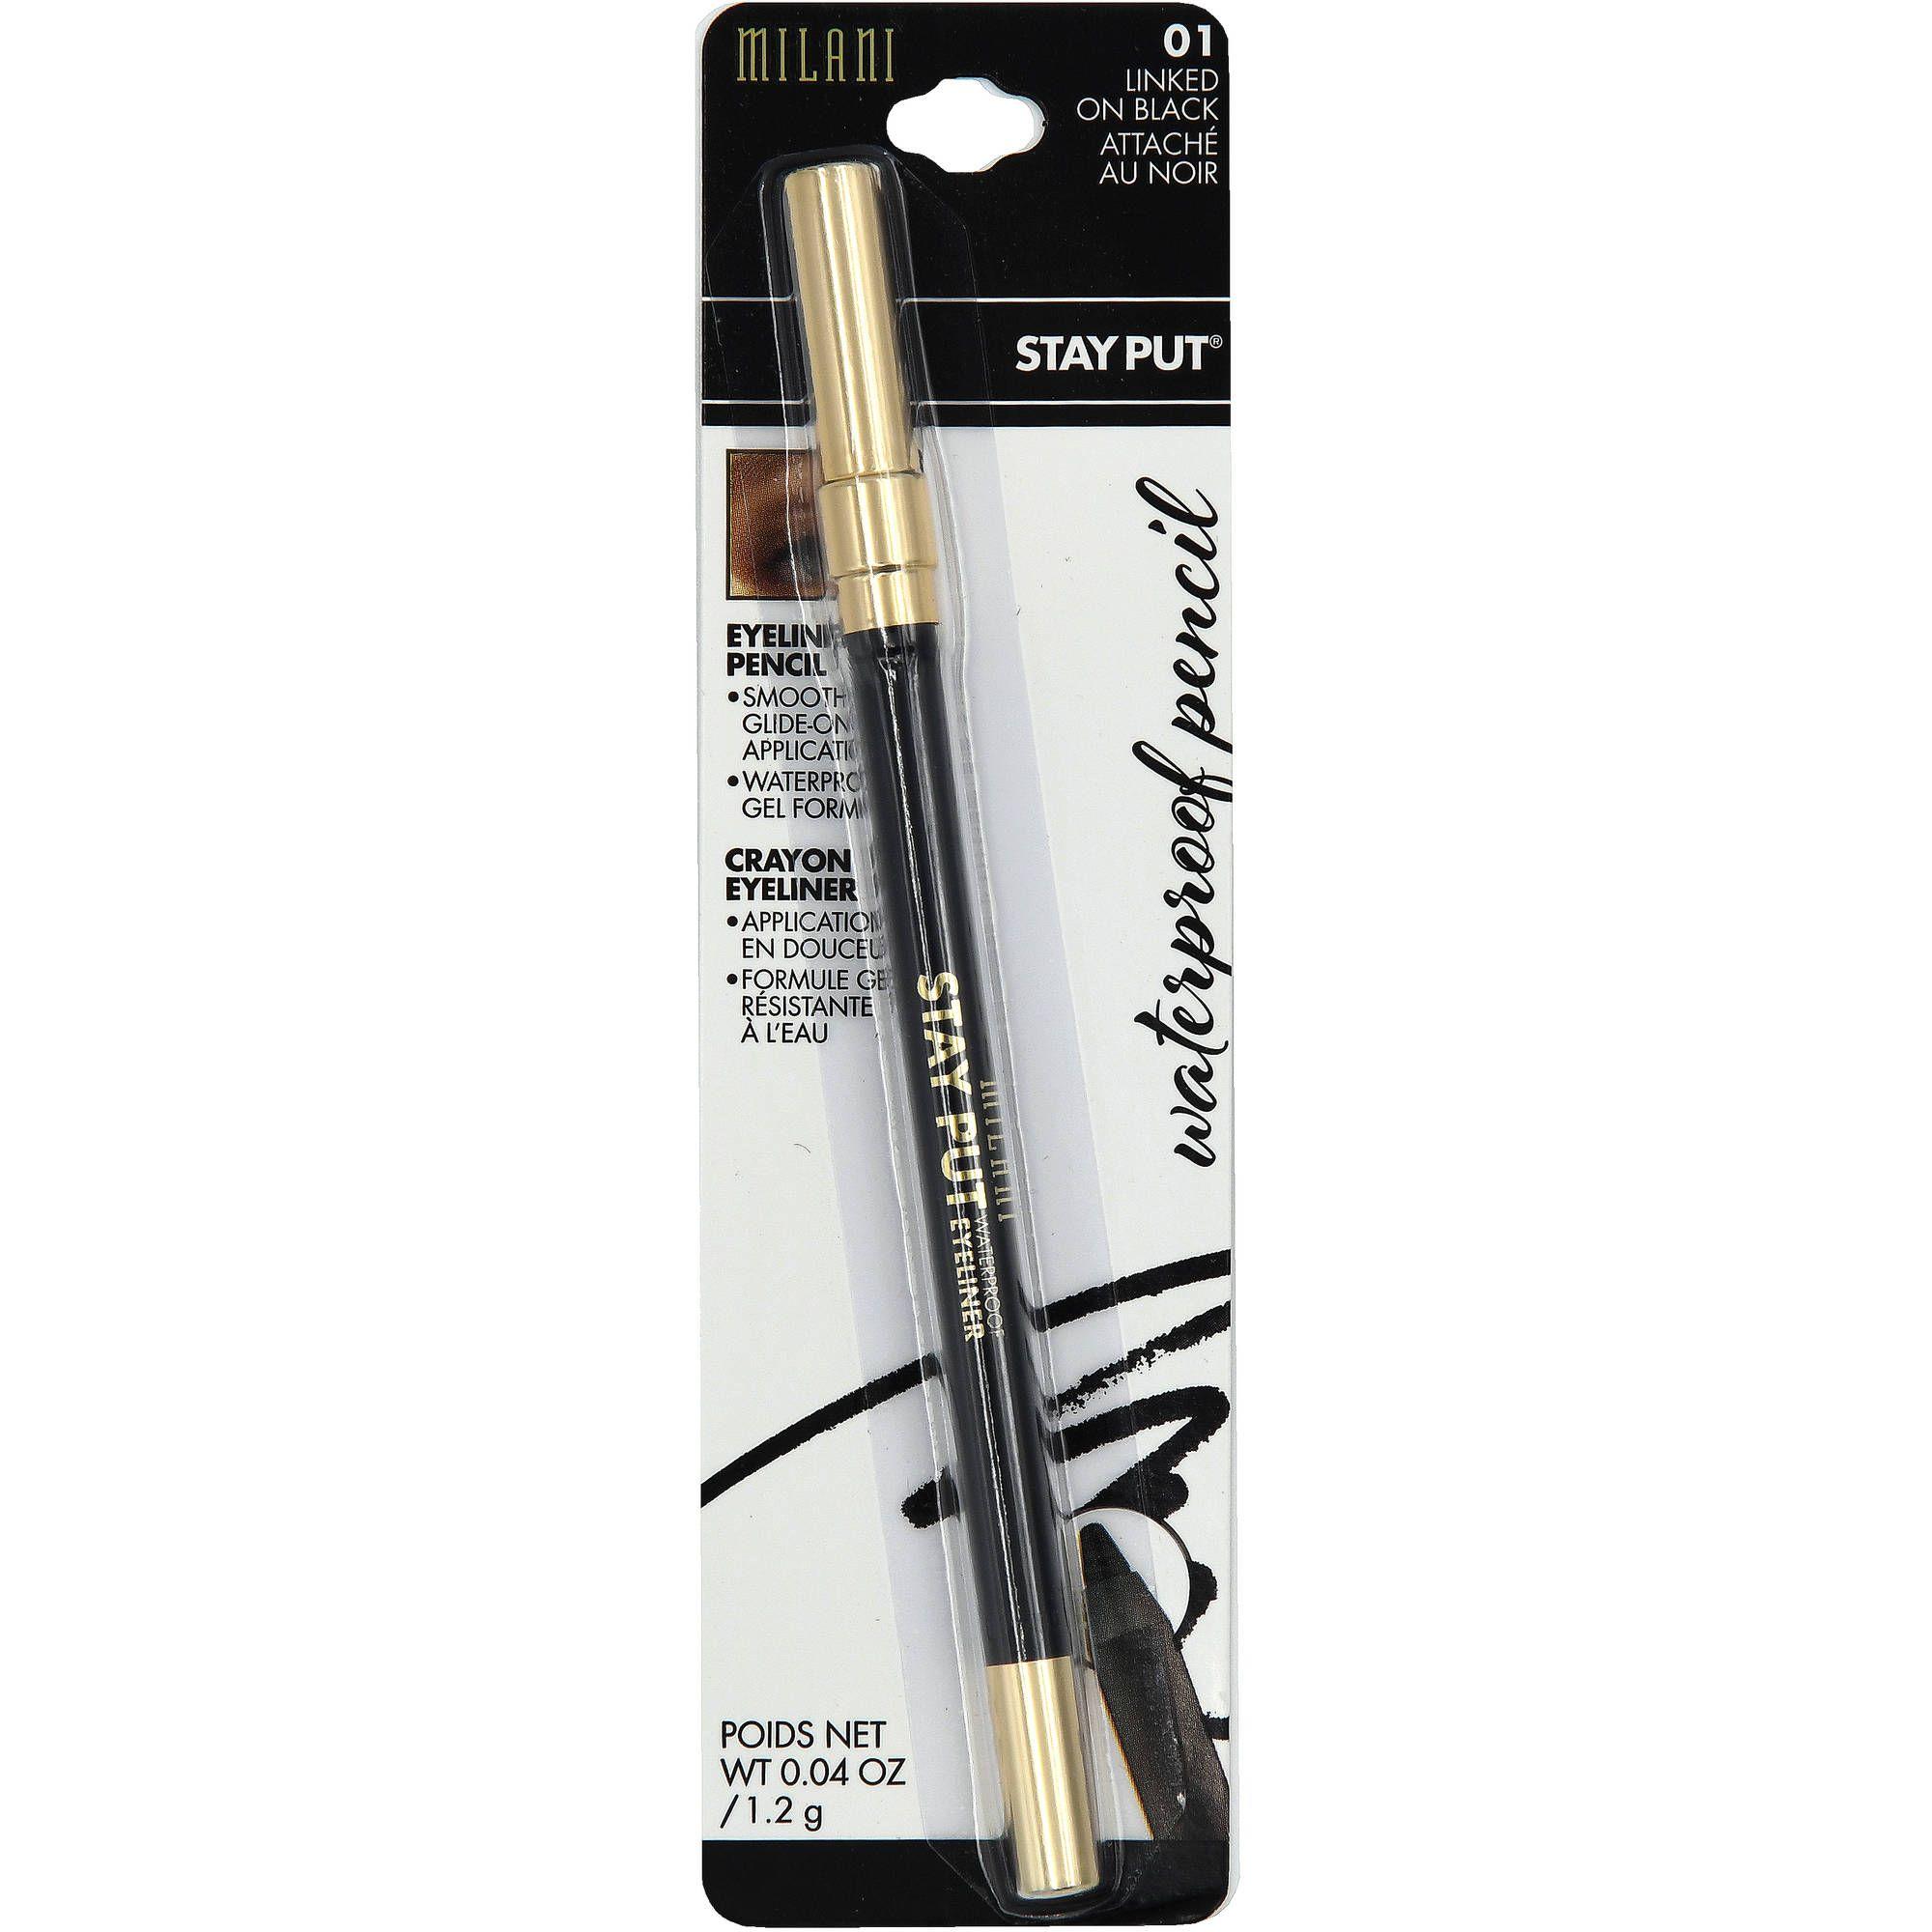 MILANI Stay Put Waterproof Eye Liner Pencil, Linked On